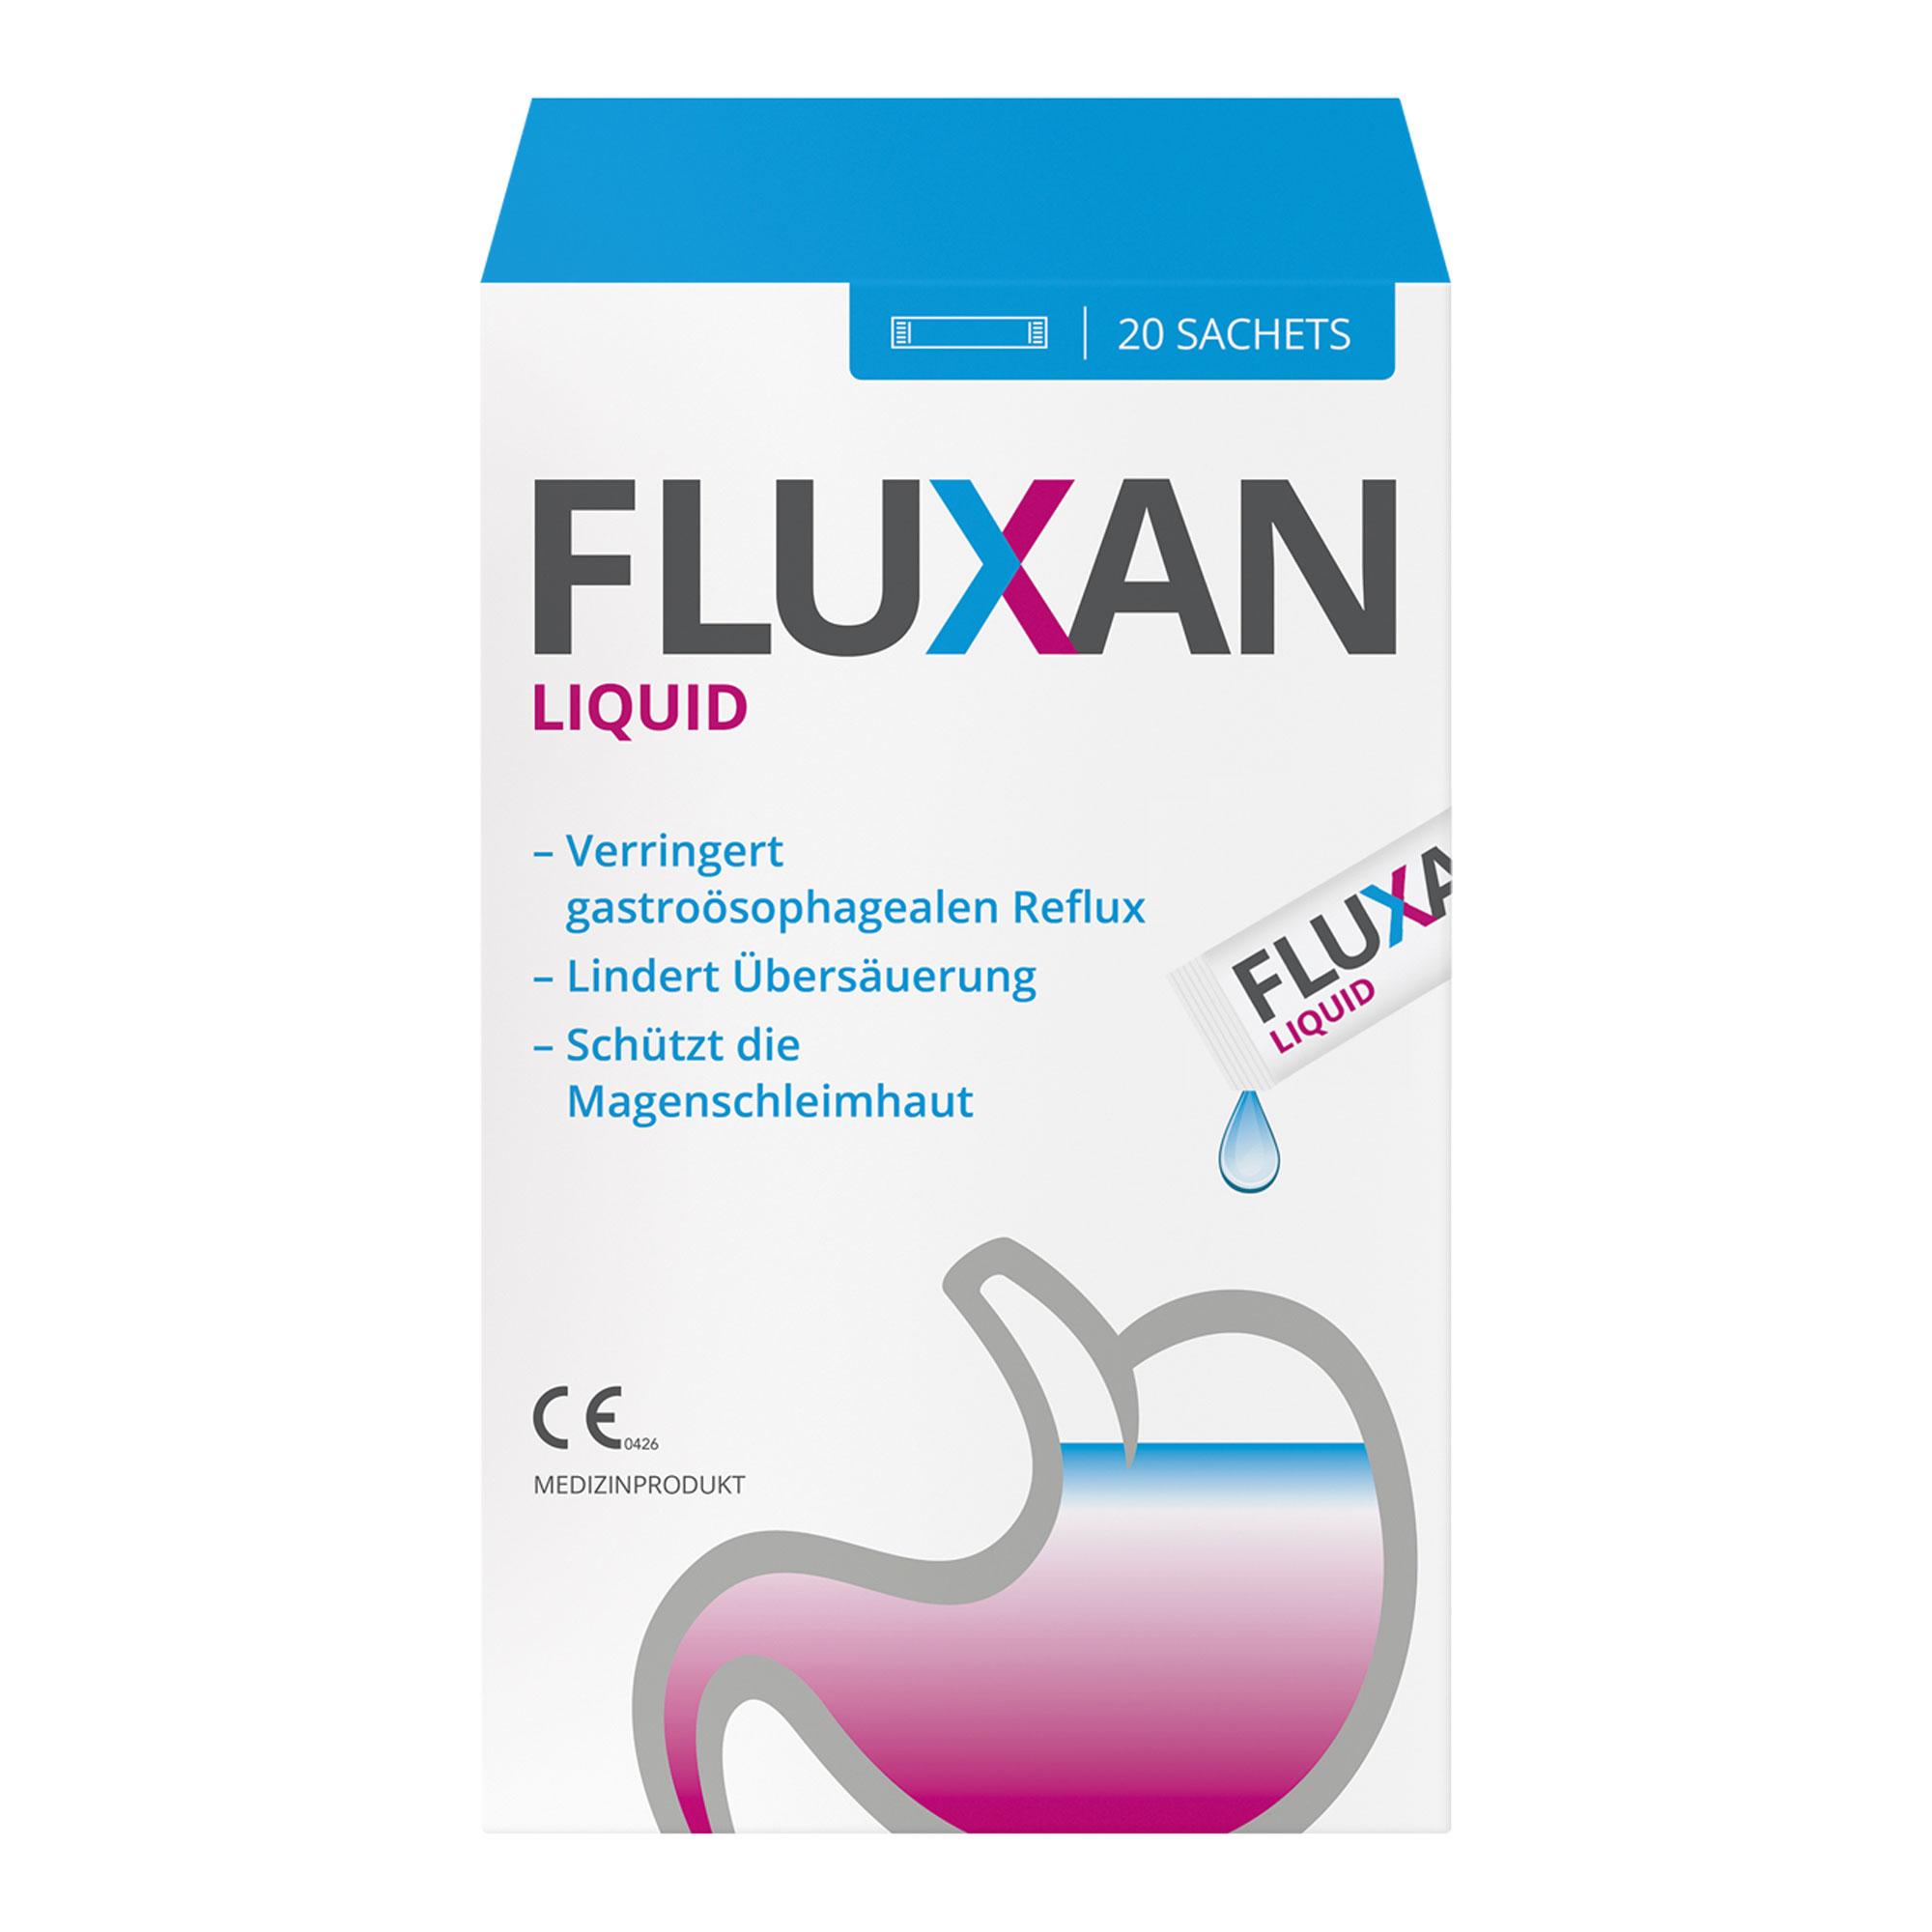 FLUXAN Liquid